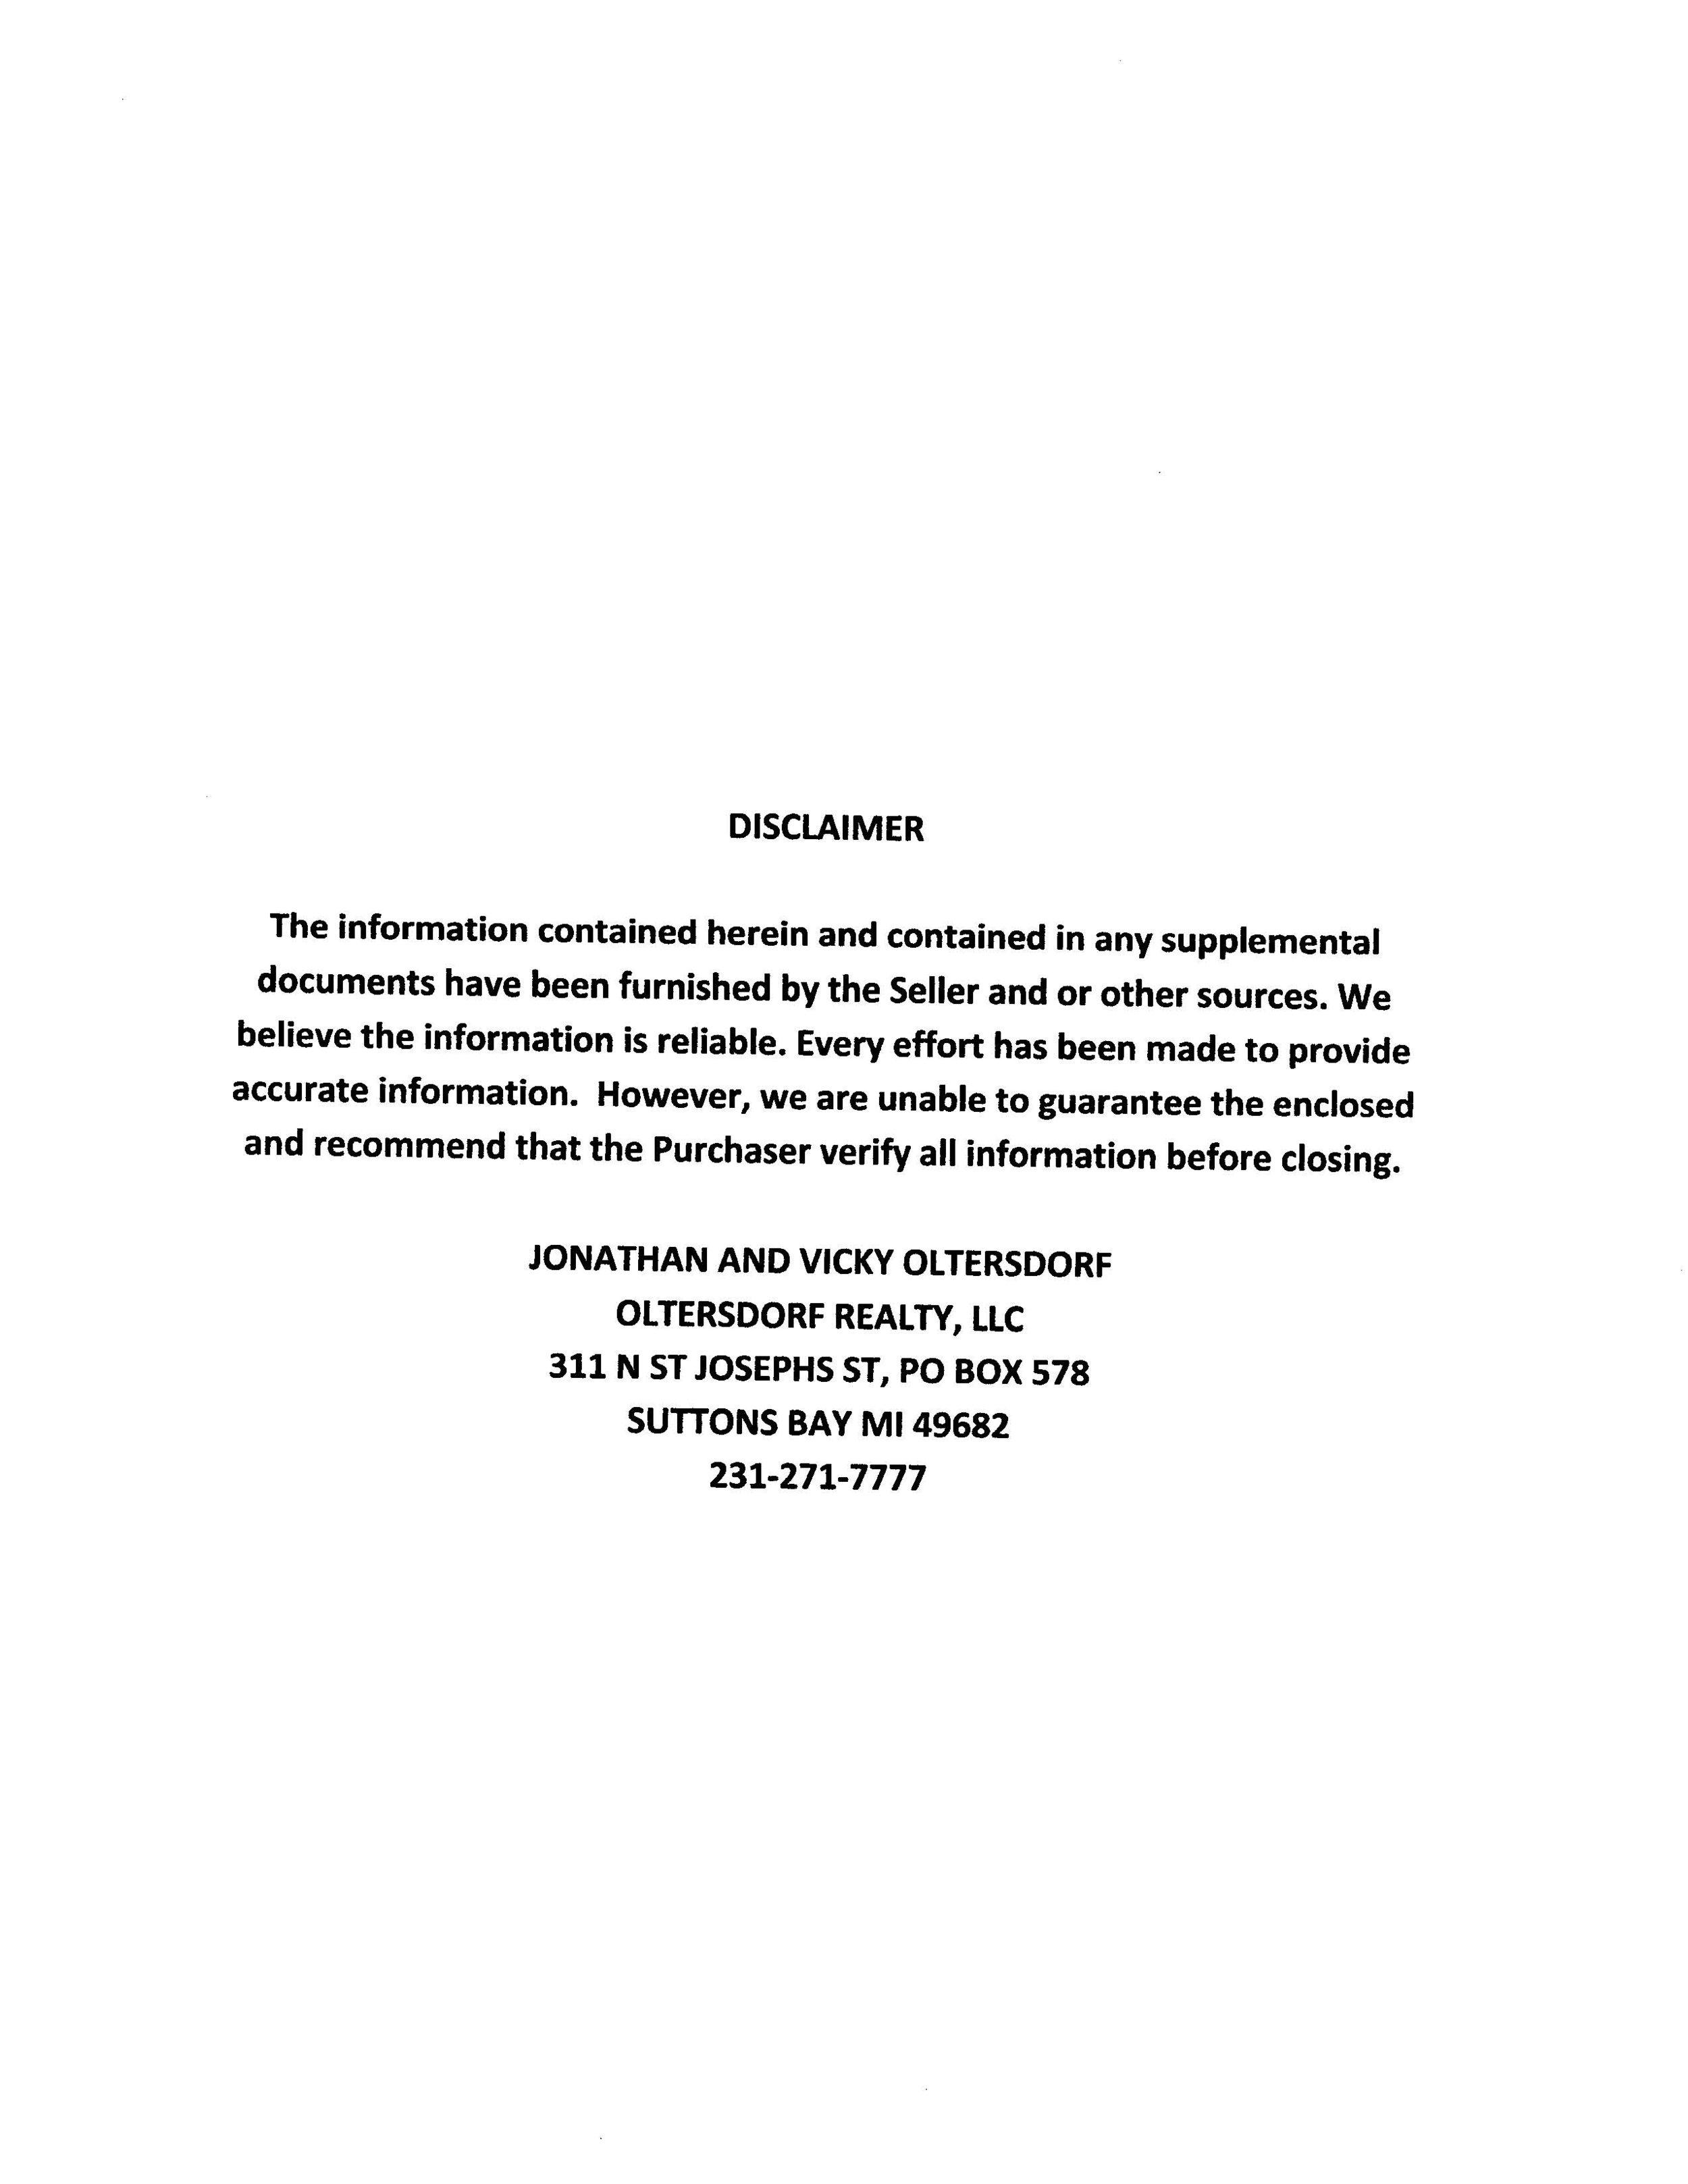 4388 N Manitou Trail, Leland - Marketing packet by Oltersdorf Realty LLC (44).jpg